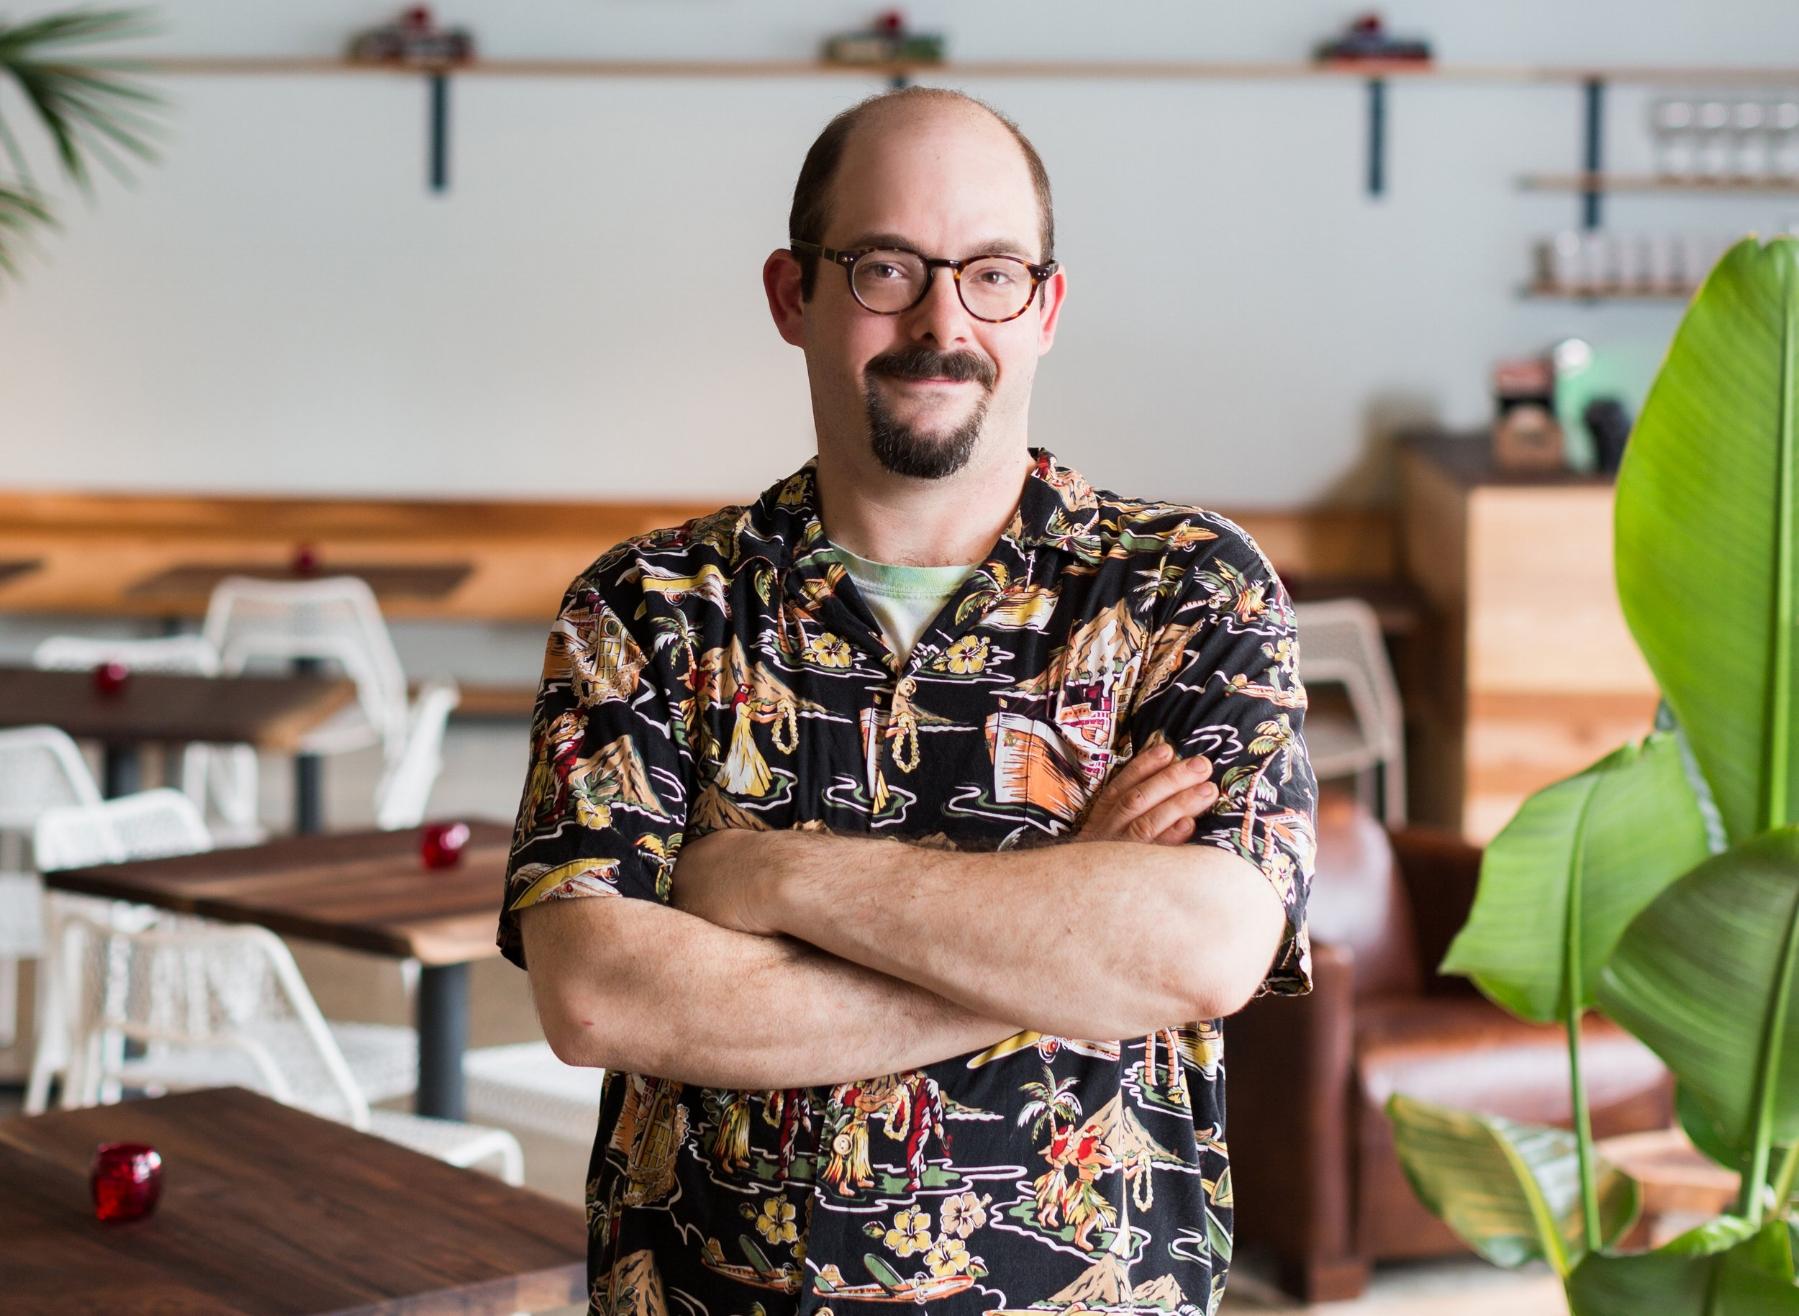 Night Heron executive chef Jacob Pate